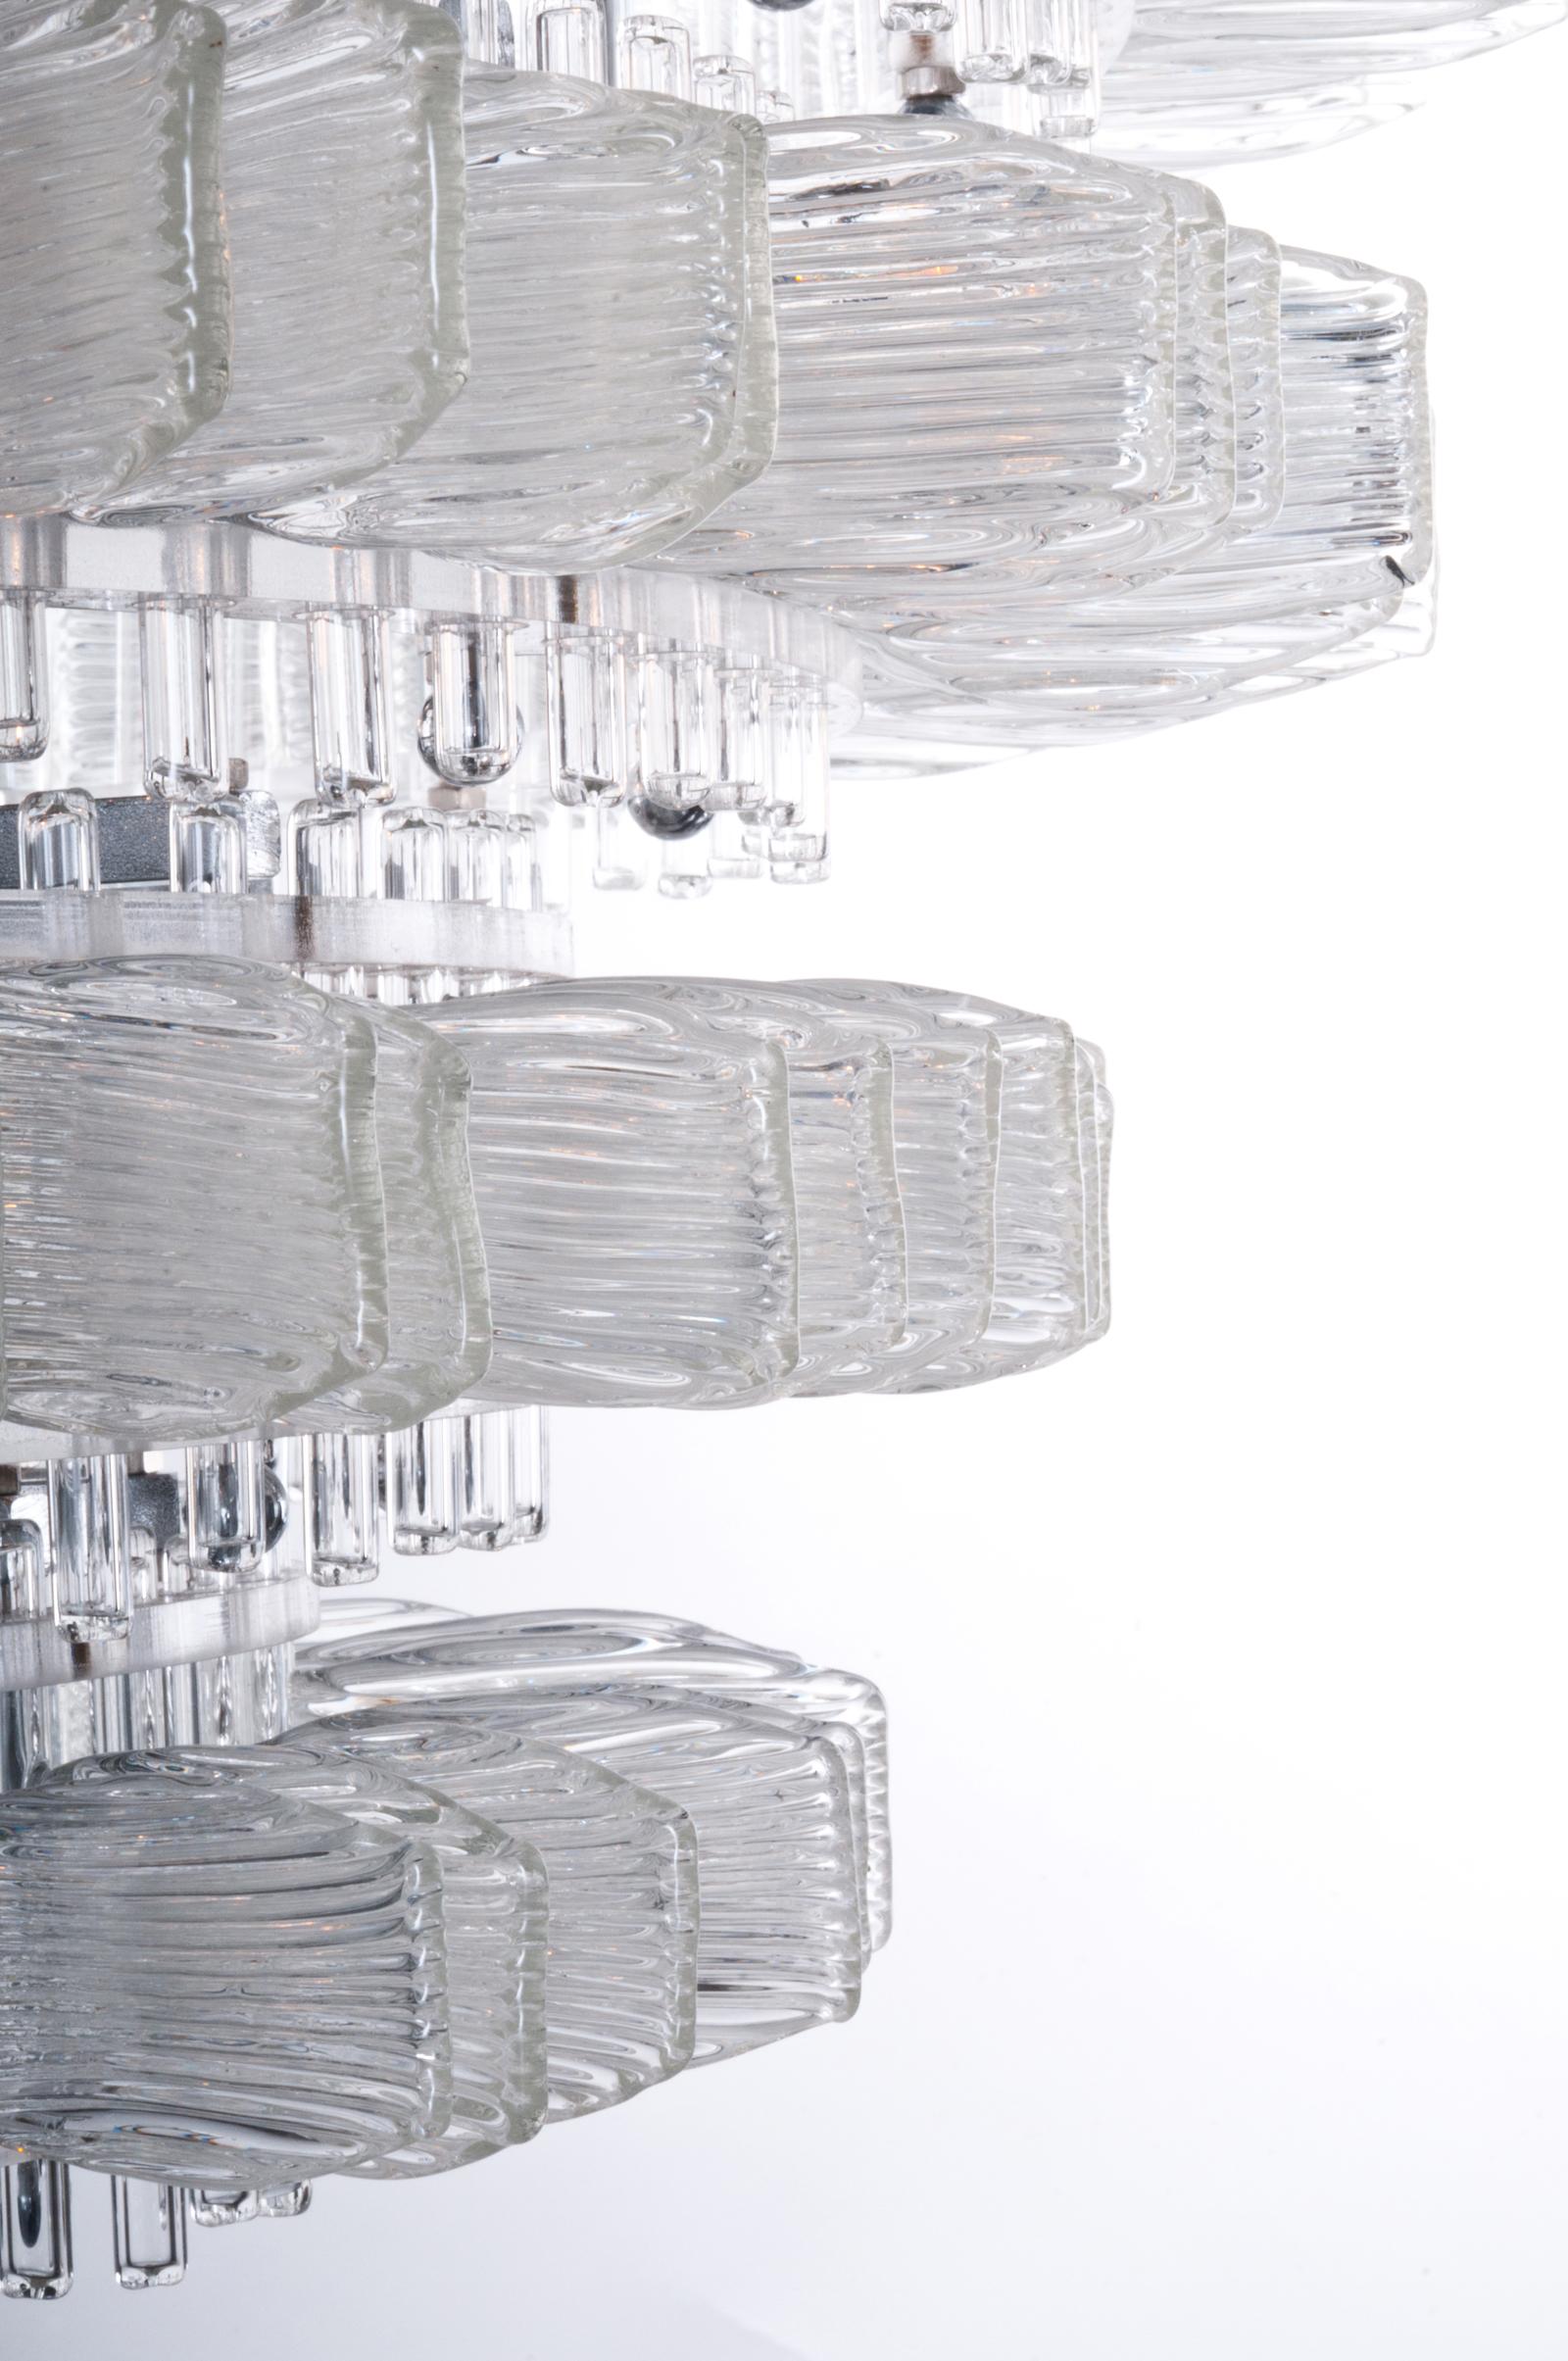 anemone-plafonnier-ceiling-veronese-tal-lancman-maurizio-galante-141.jpg